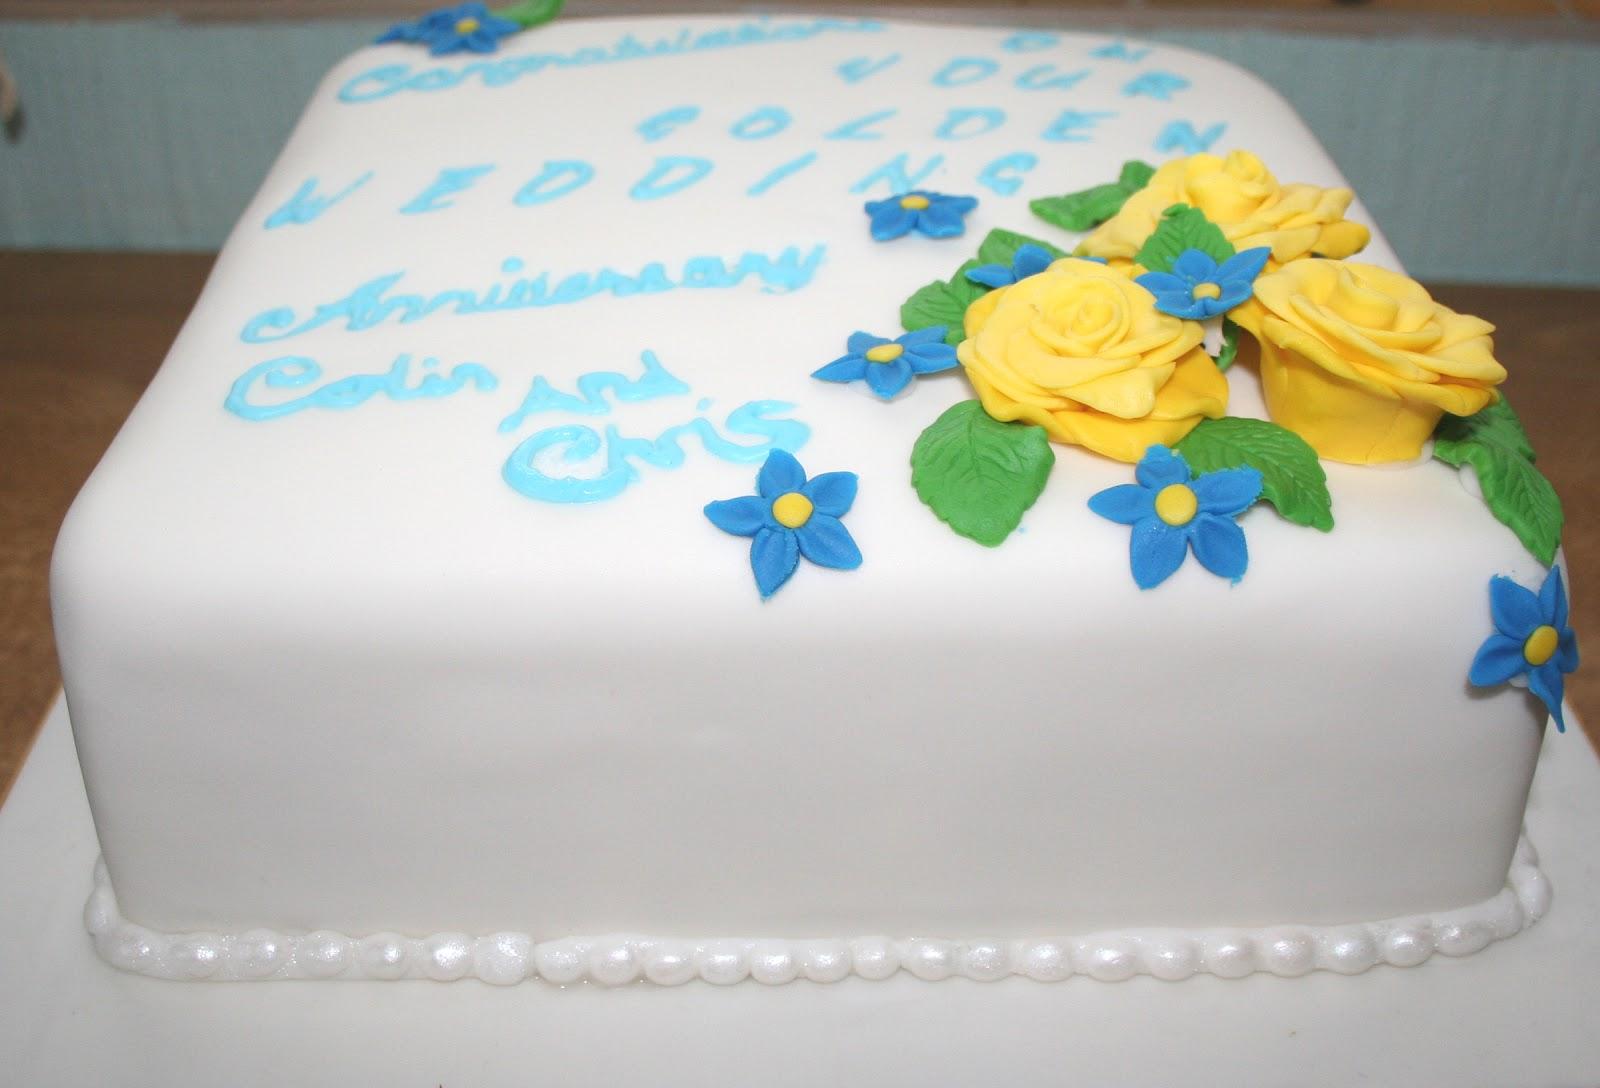 Chintzy Cakes: Golden Wedding Anniversary Cake